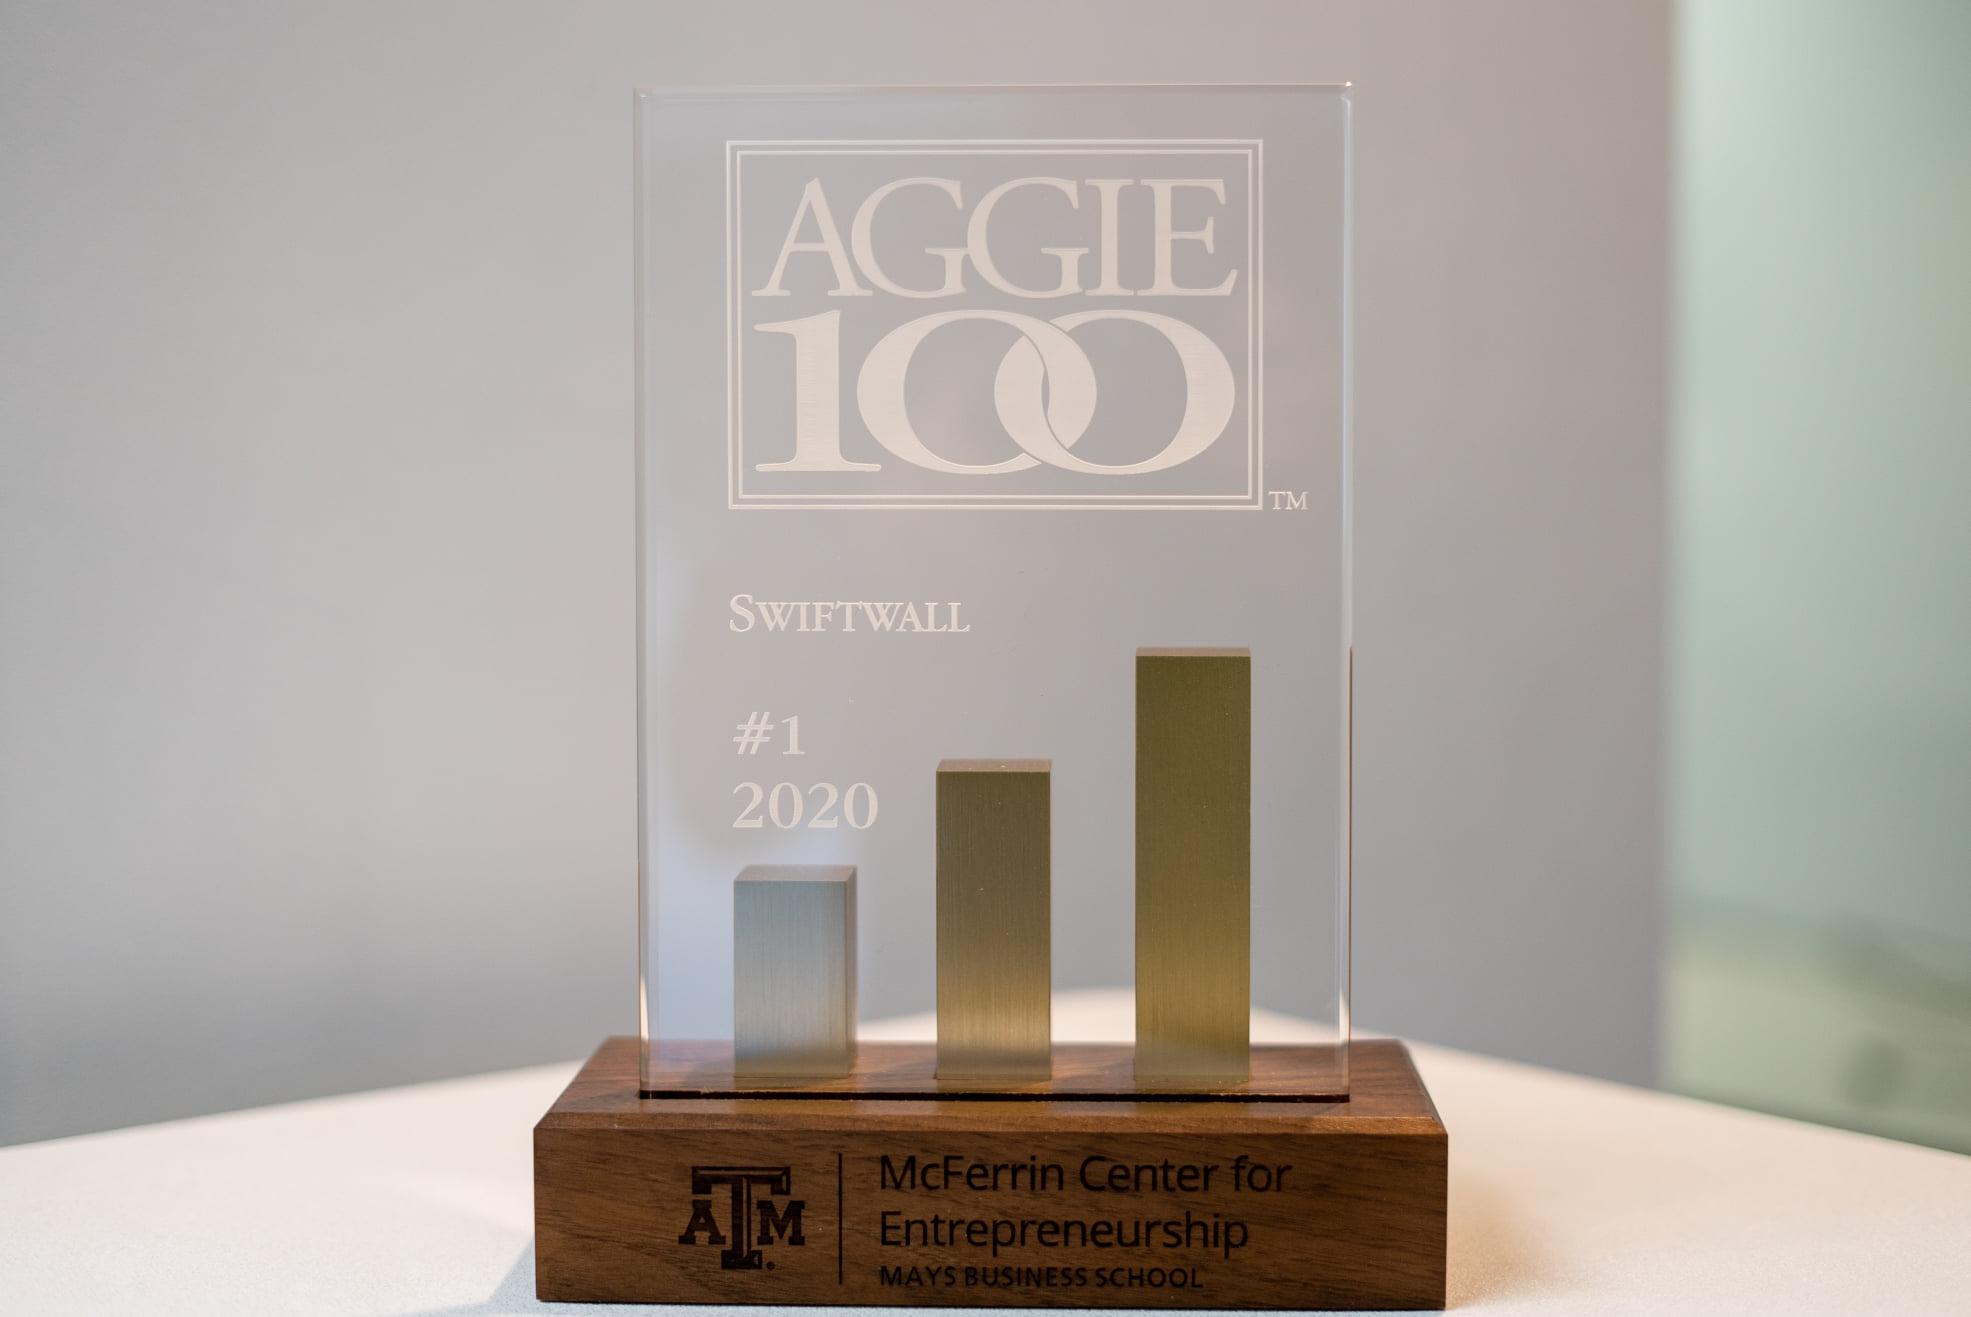 Swiftwall Aggie 100 Award